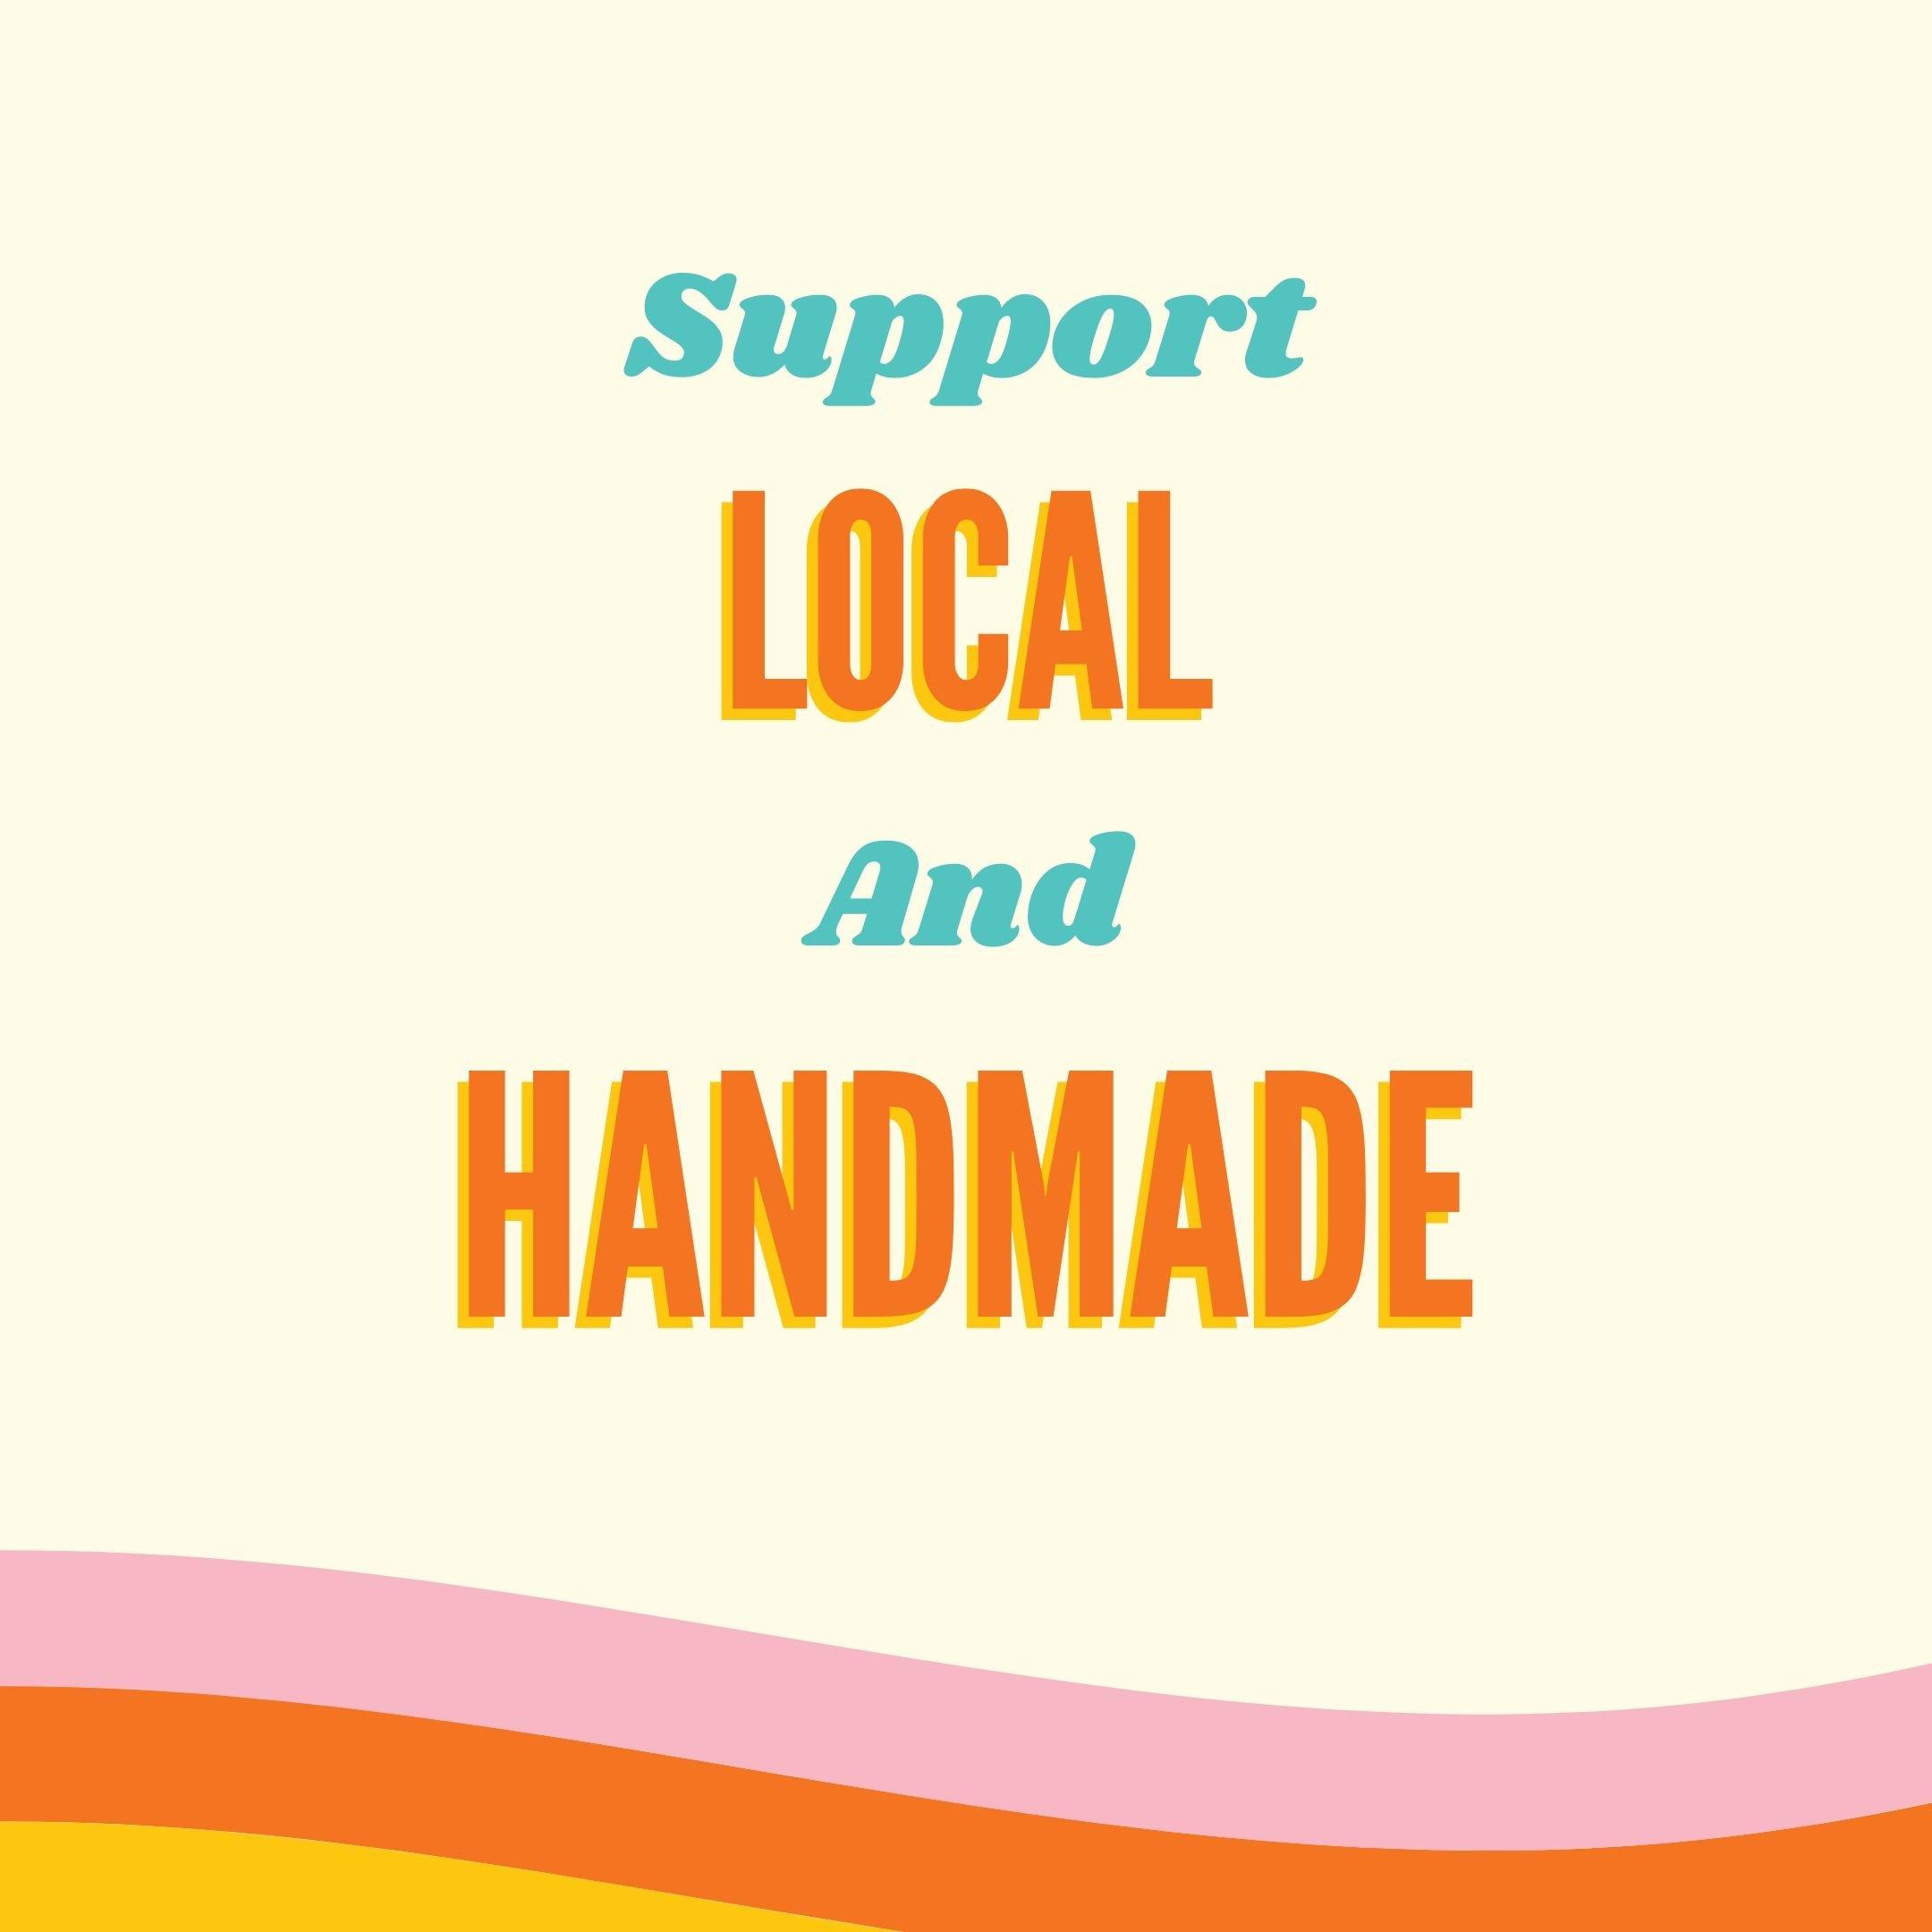 support handmade